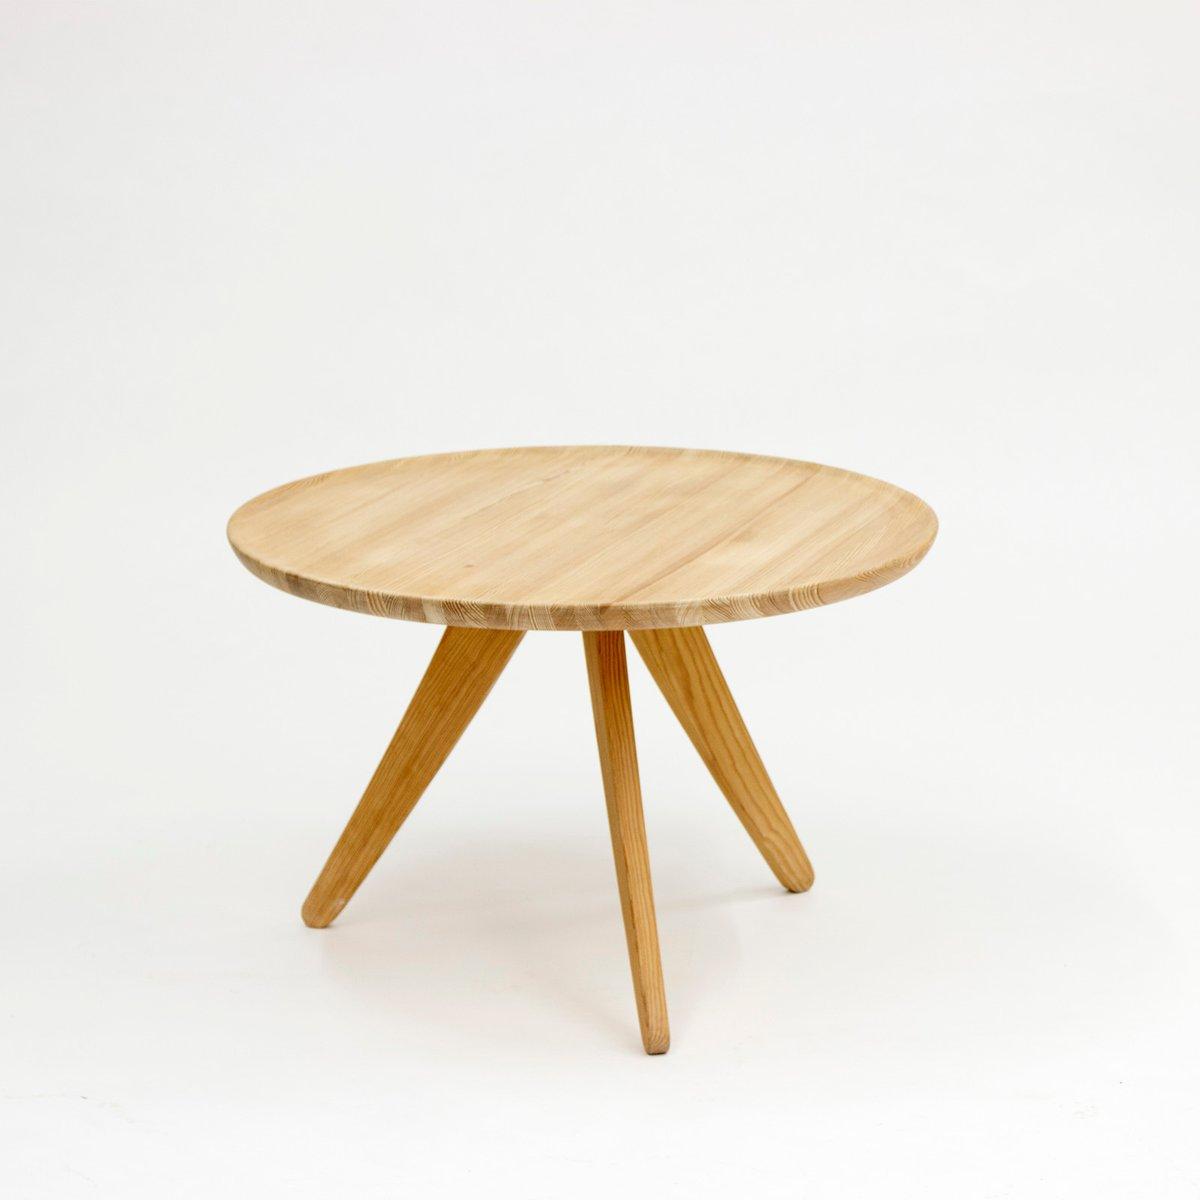 Swedish Pine Tripod Coffee Table, 1960s for sale at Pamono